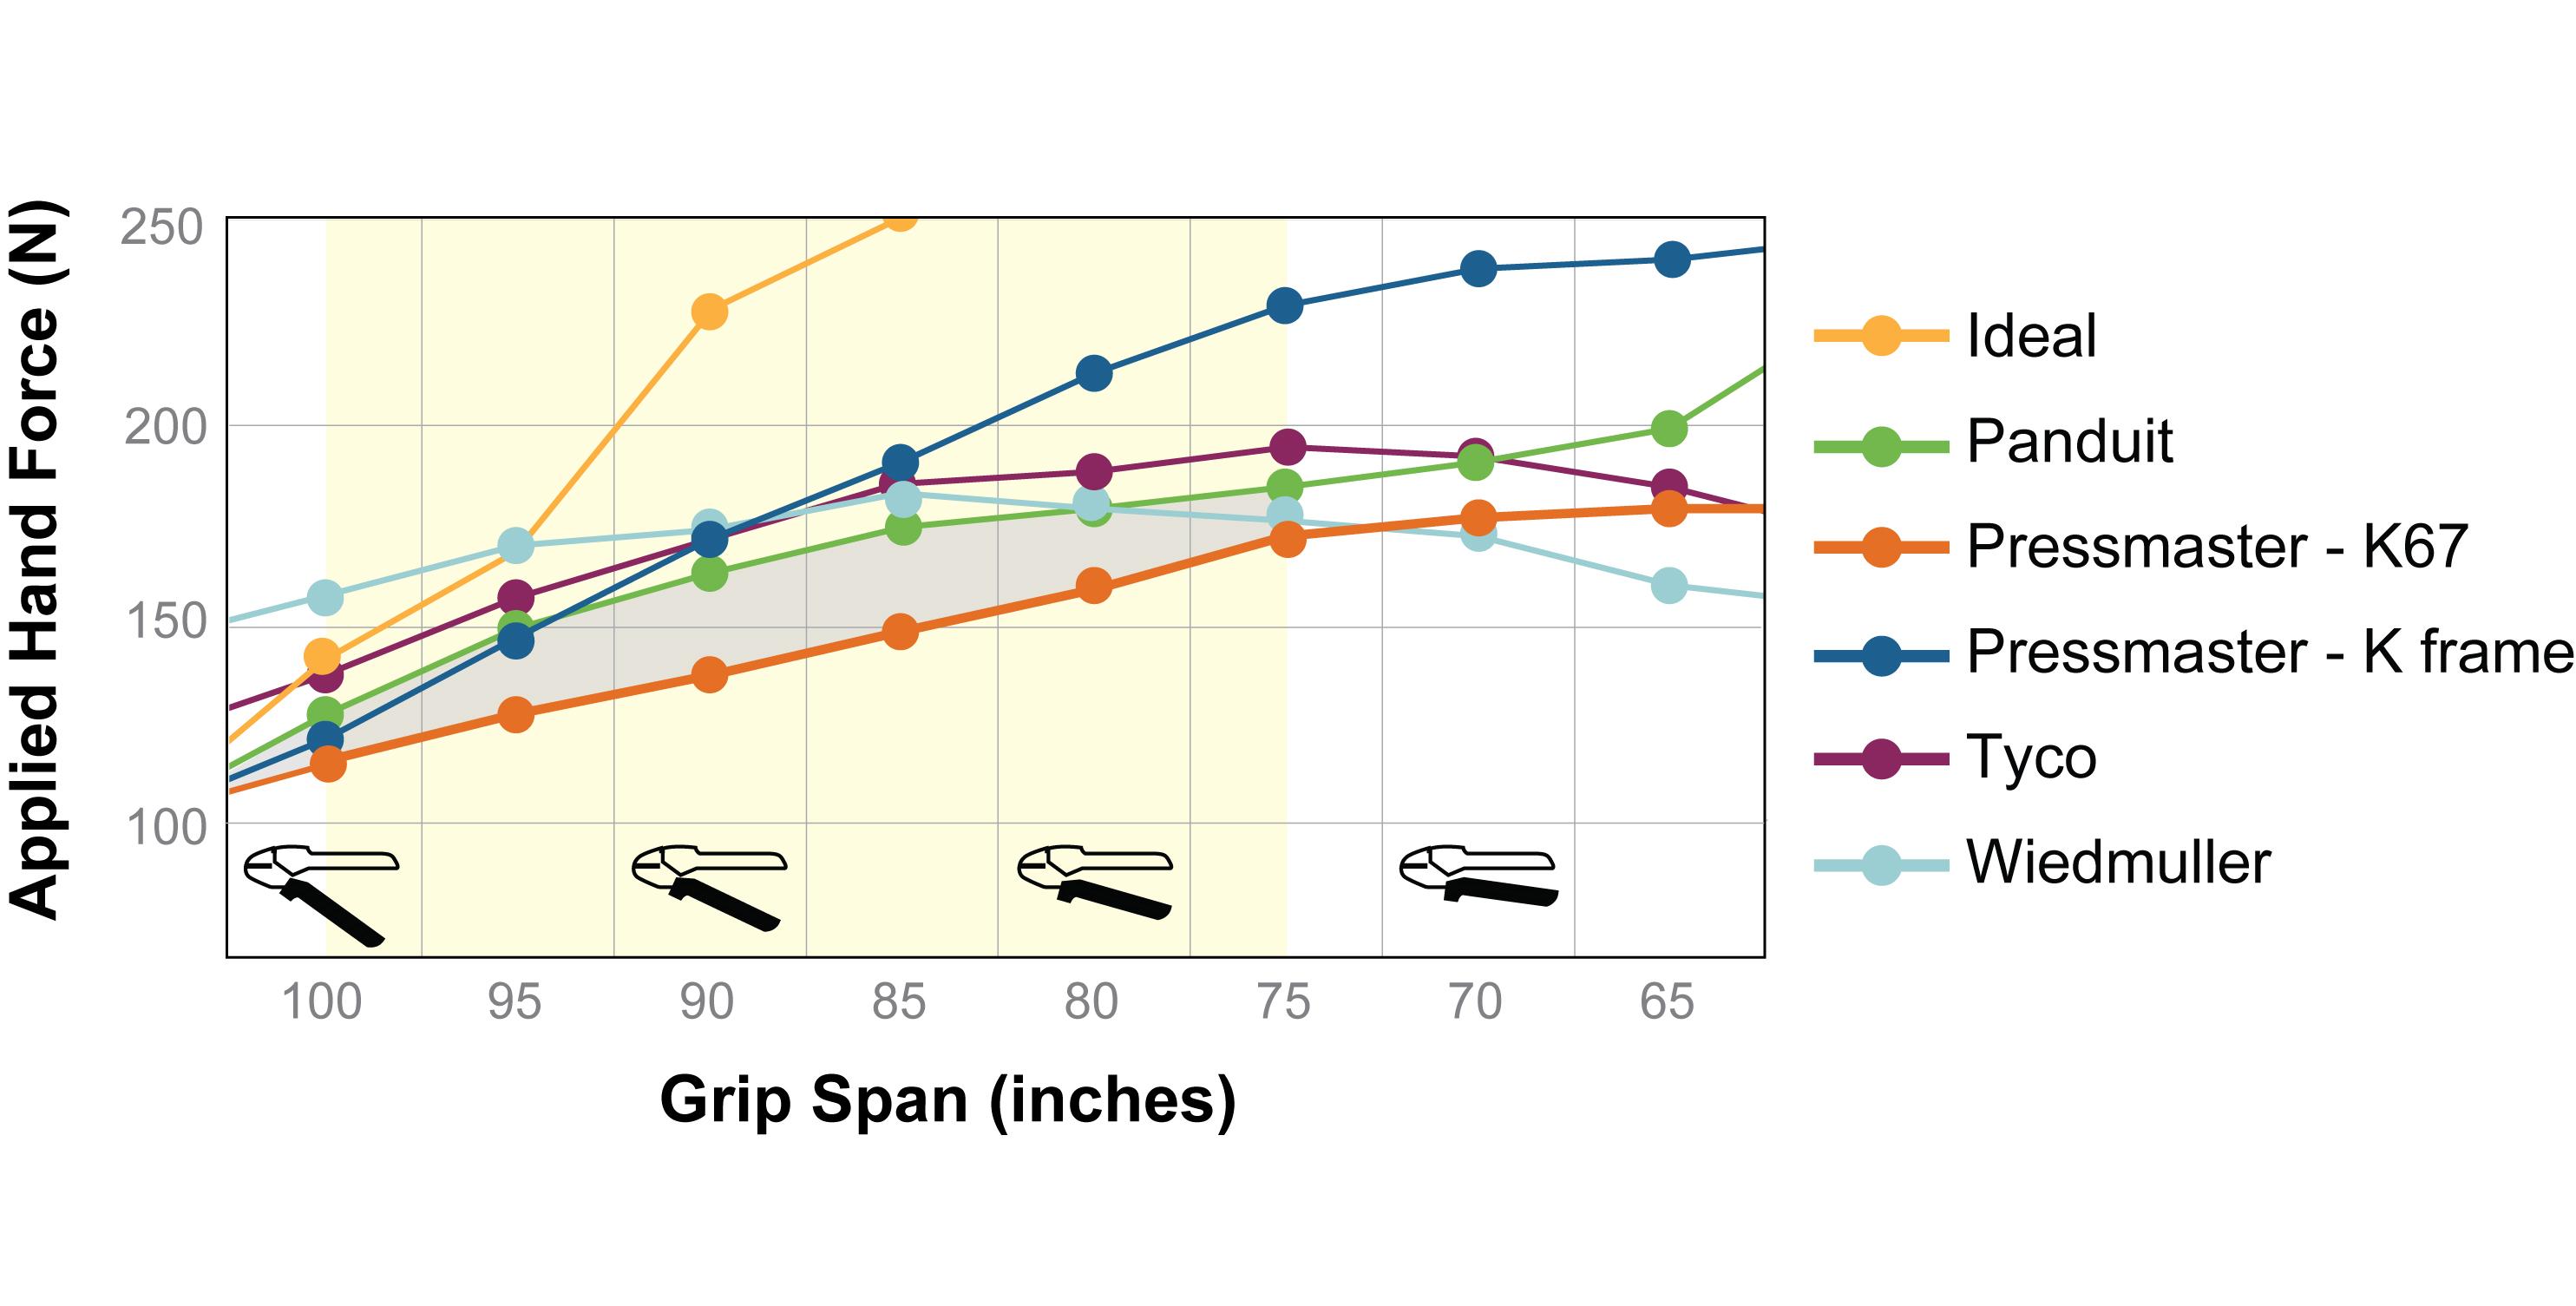 Designing For Humans Anthropometric Data Ergonomics Kite Diagrams Youtube Handle Force Chart4 16 09